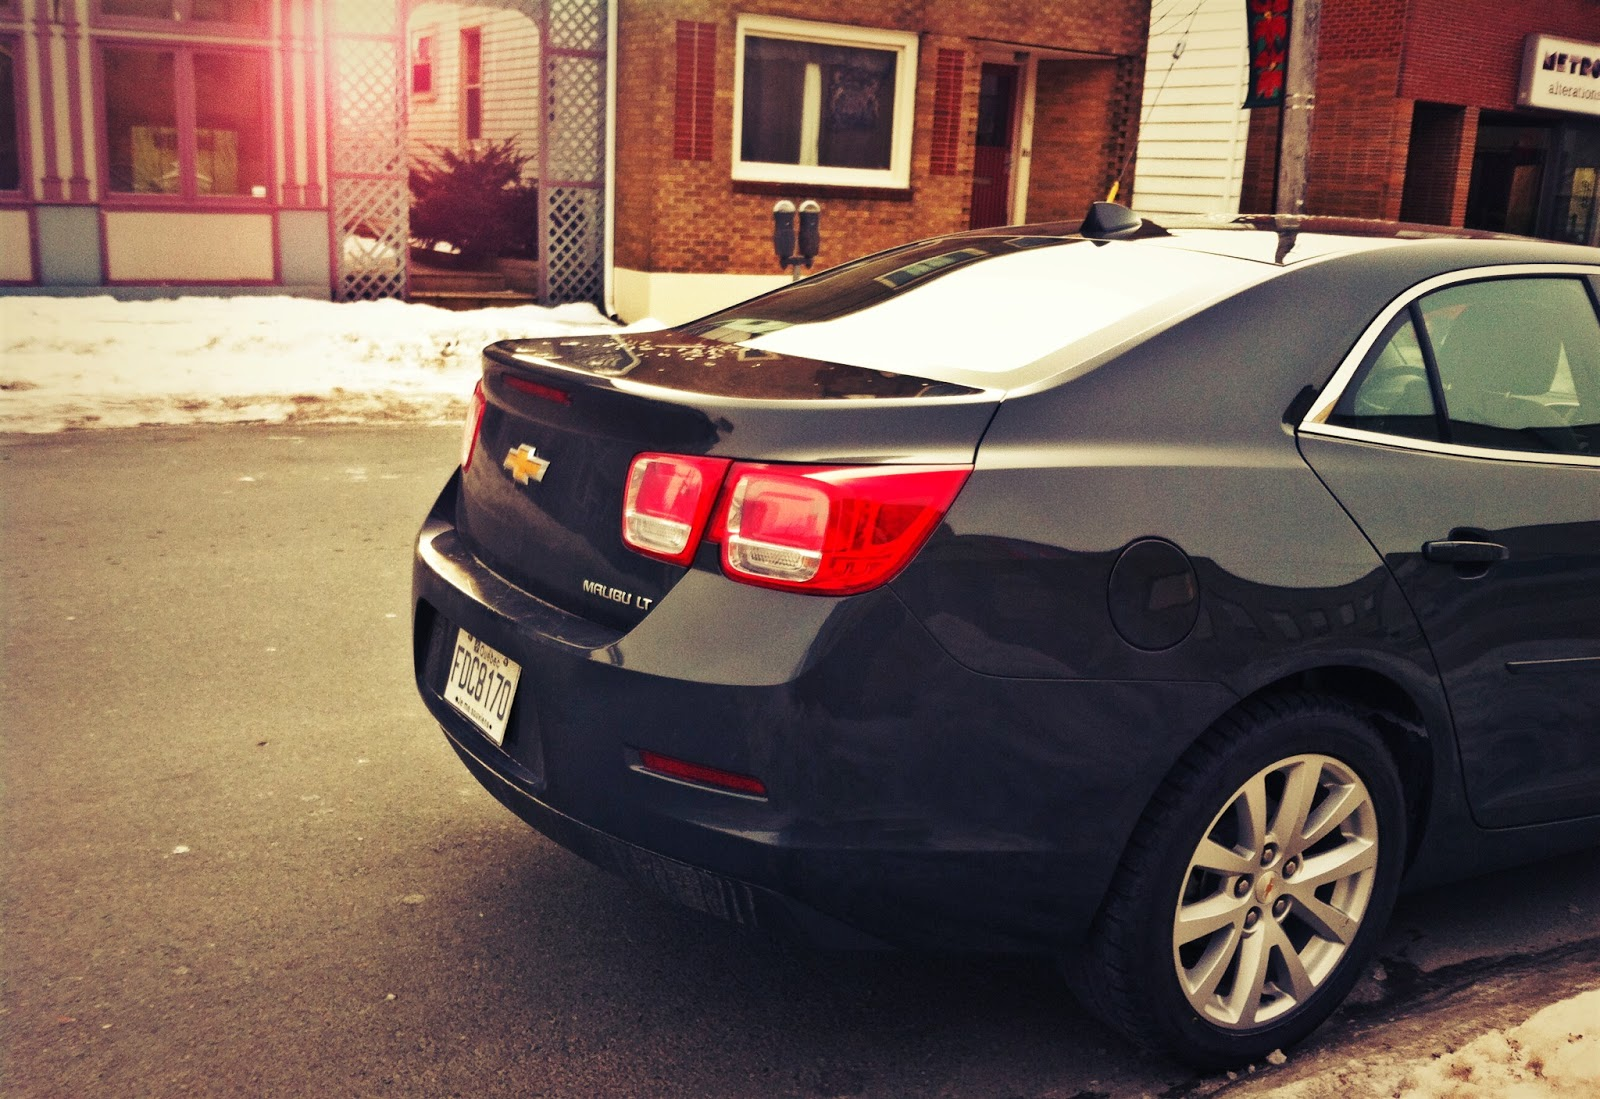 2014 Chevrolet Malibu taillights